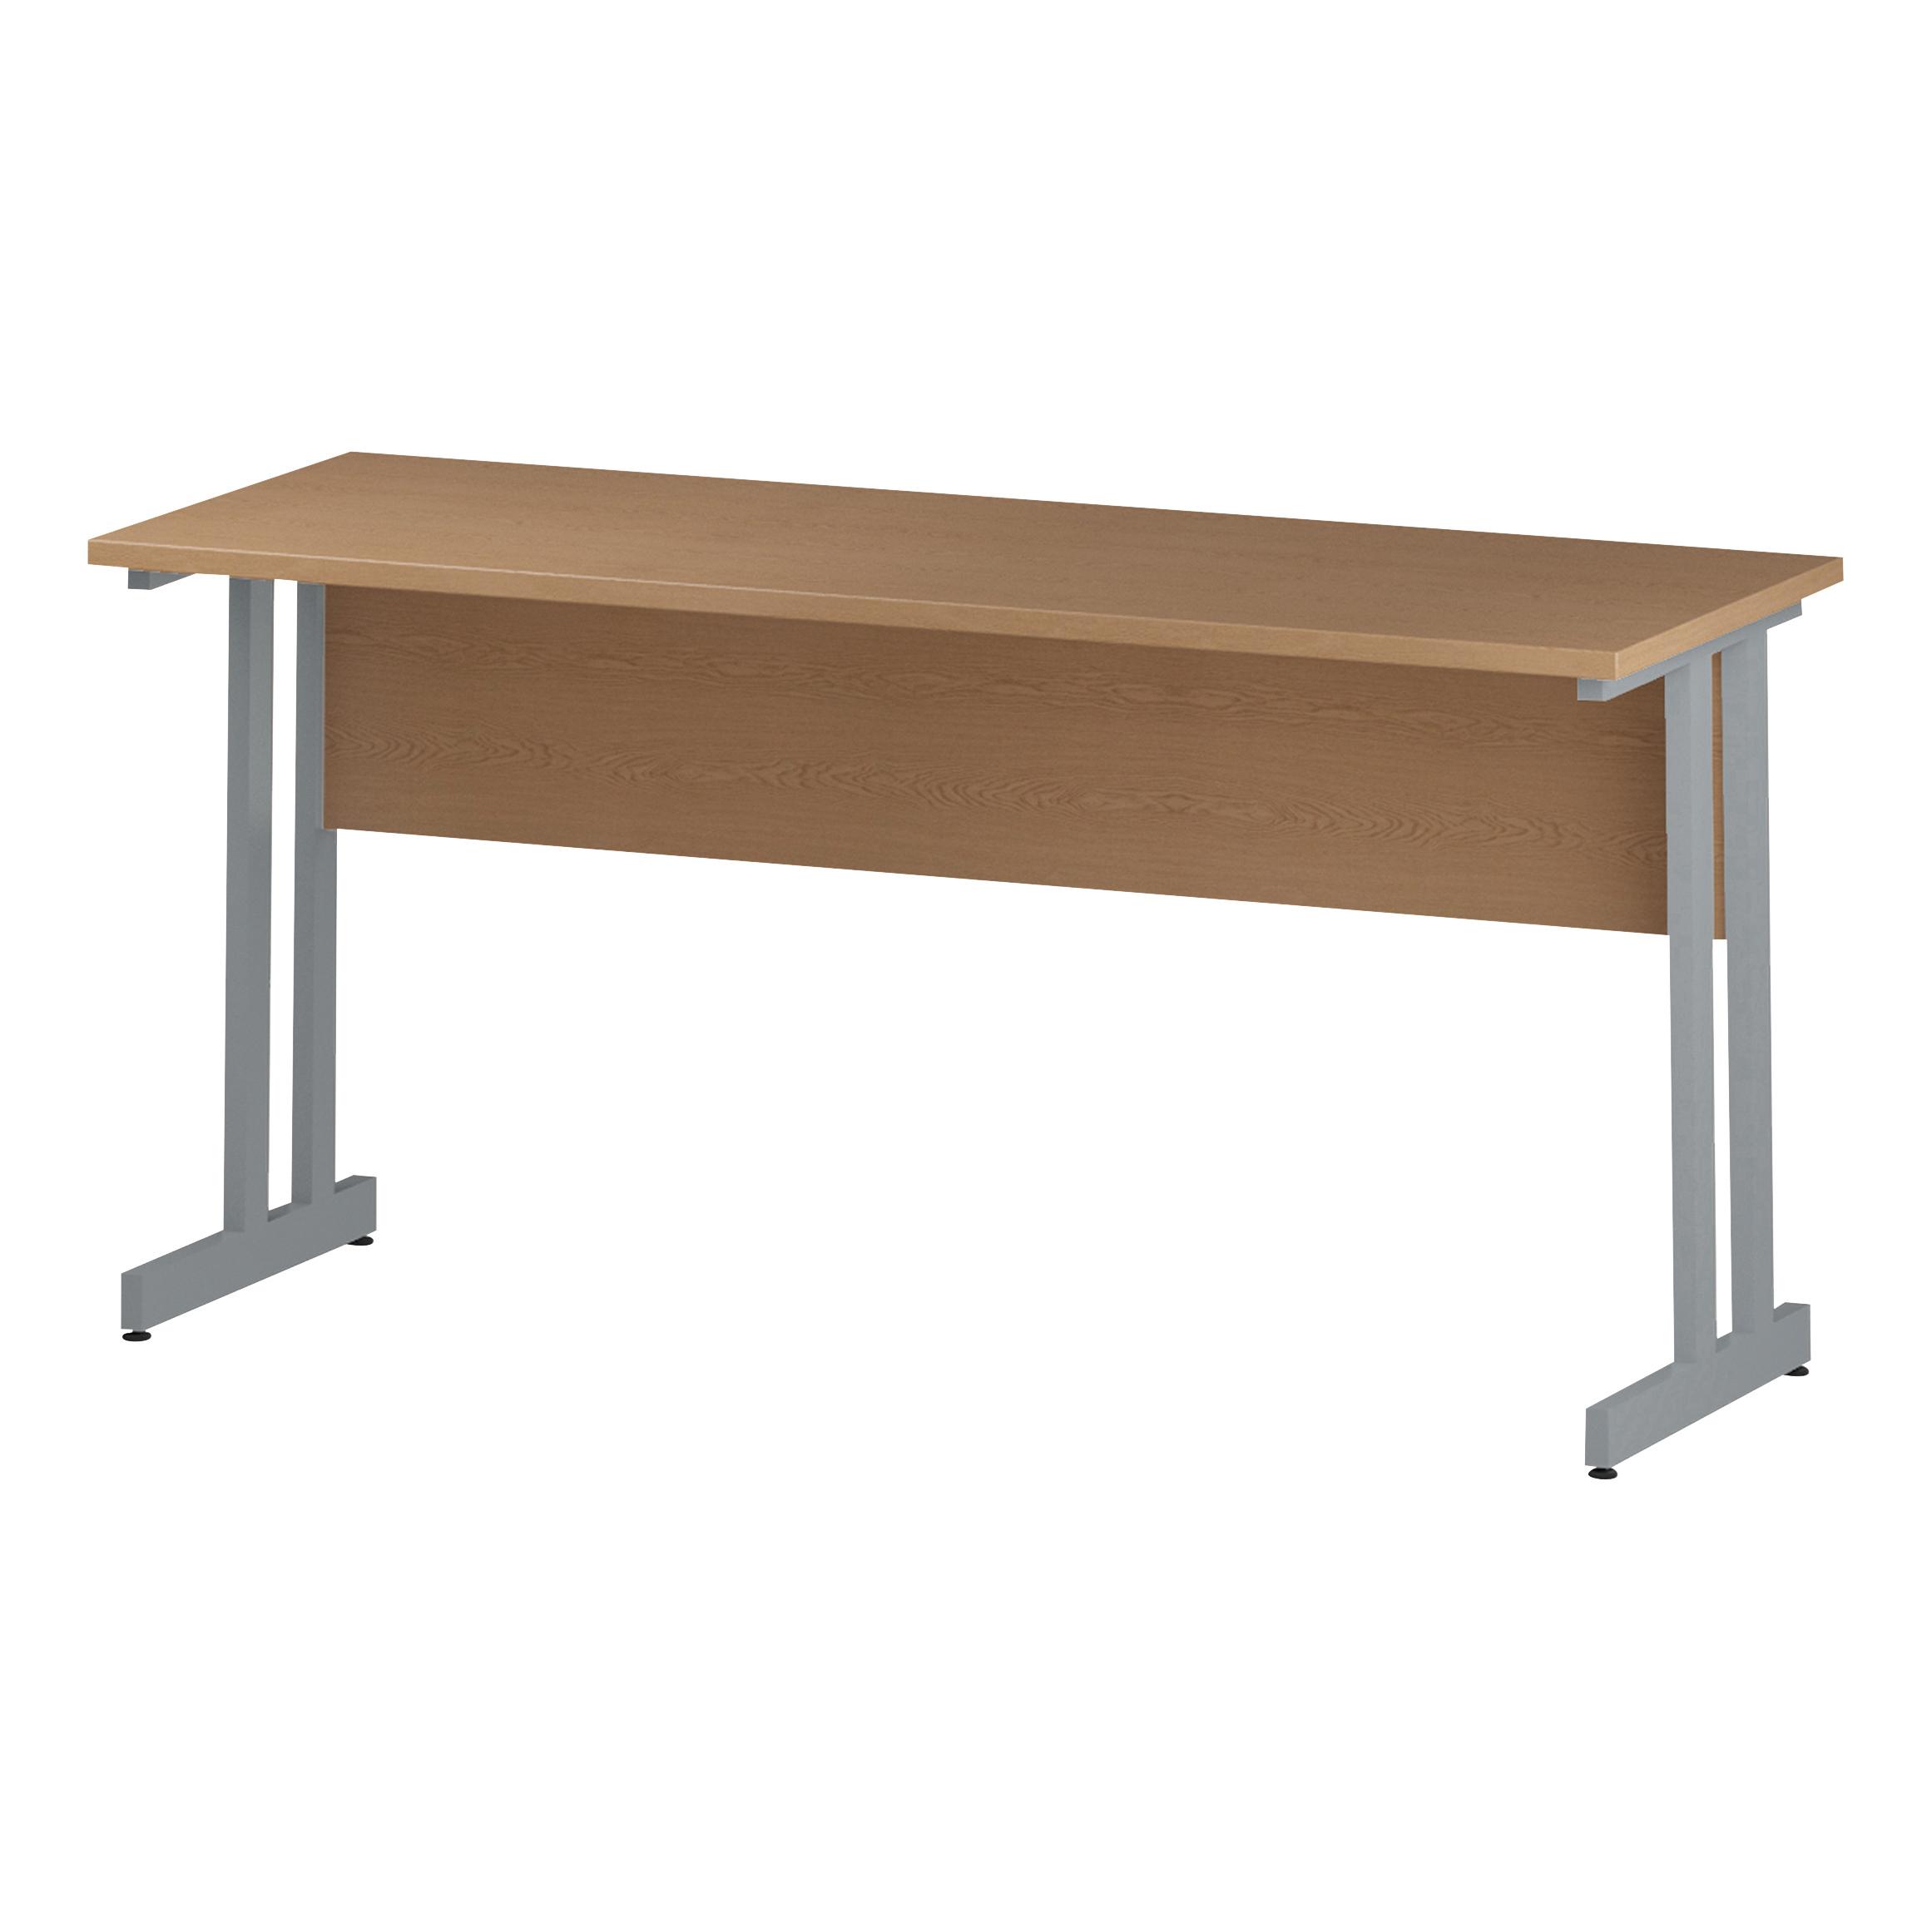 Trexus Rectangular Slim Desk Silver Cantilever Leg 1600x600mm Oak Ref I002650